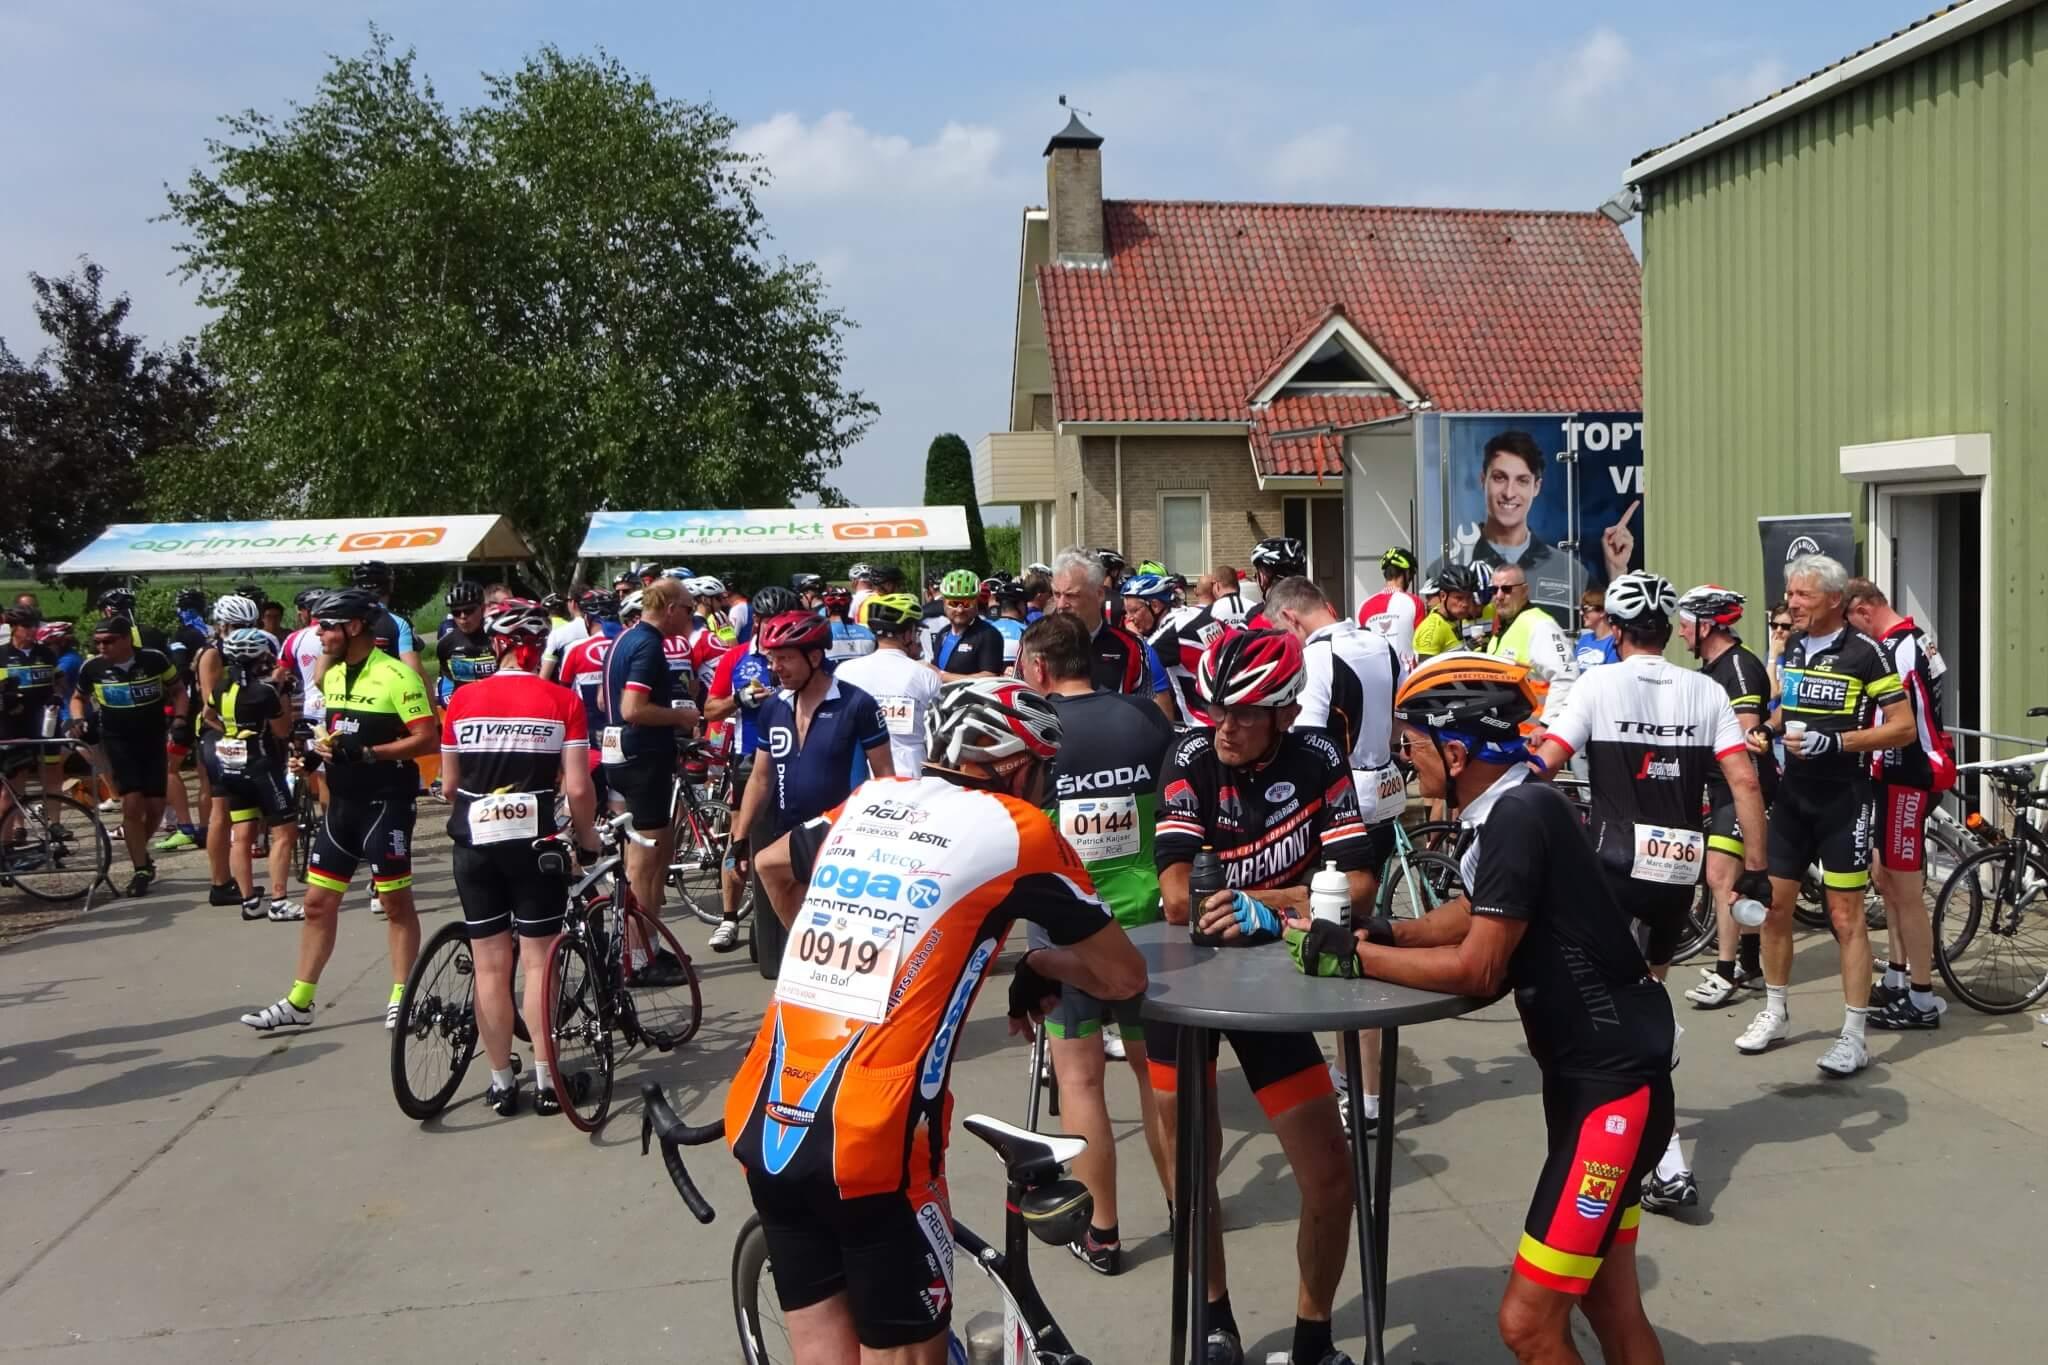 Fruitbedrijf Van den Berge_Ride for the Roses-6